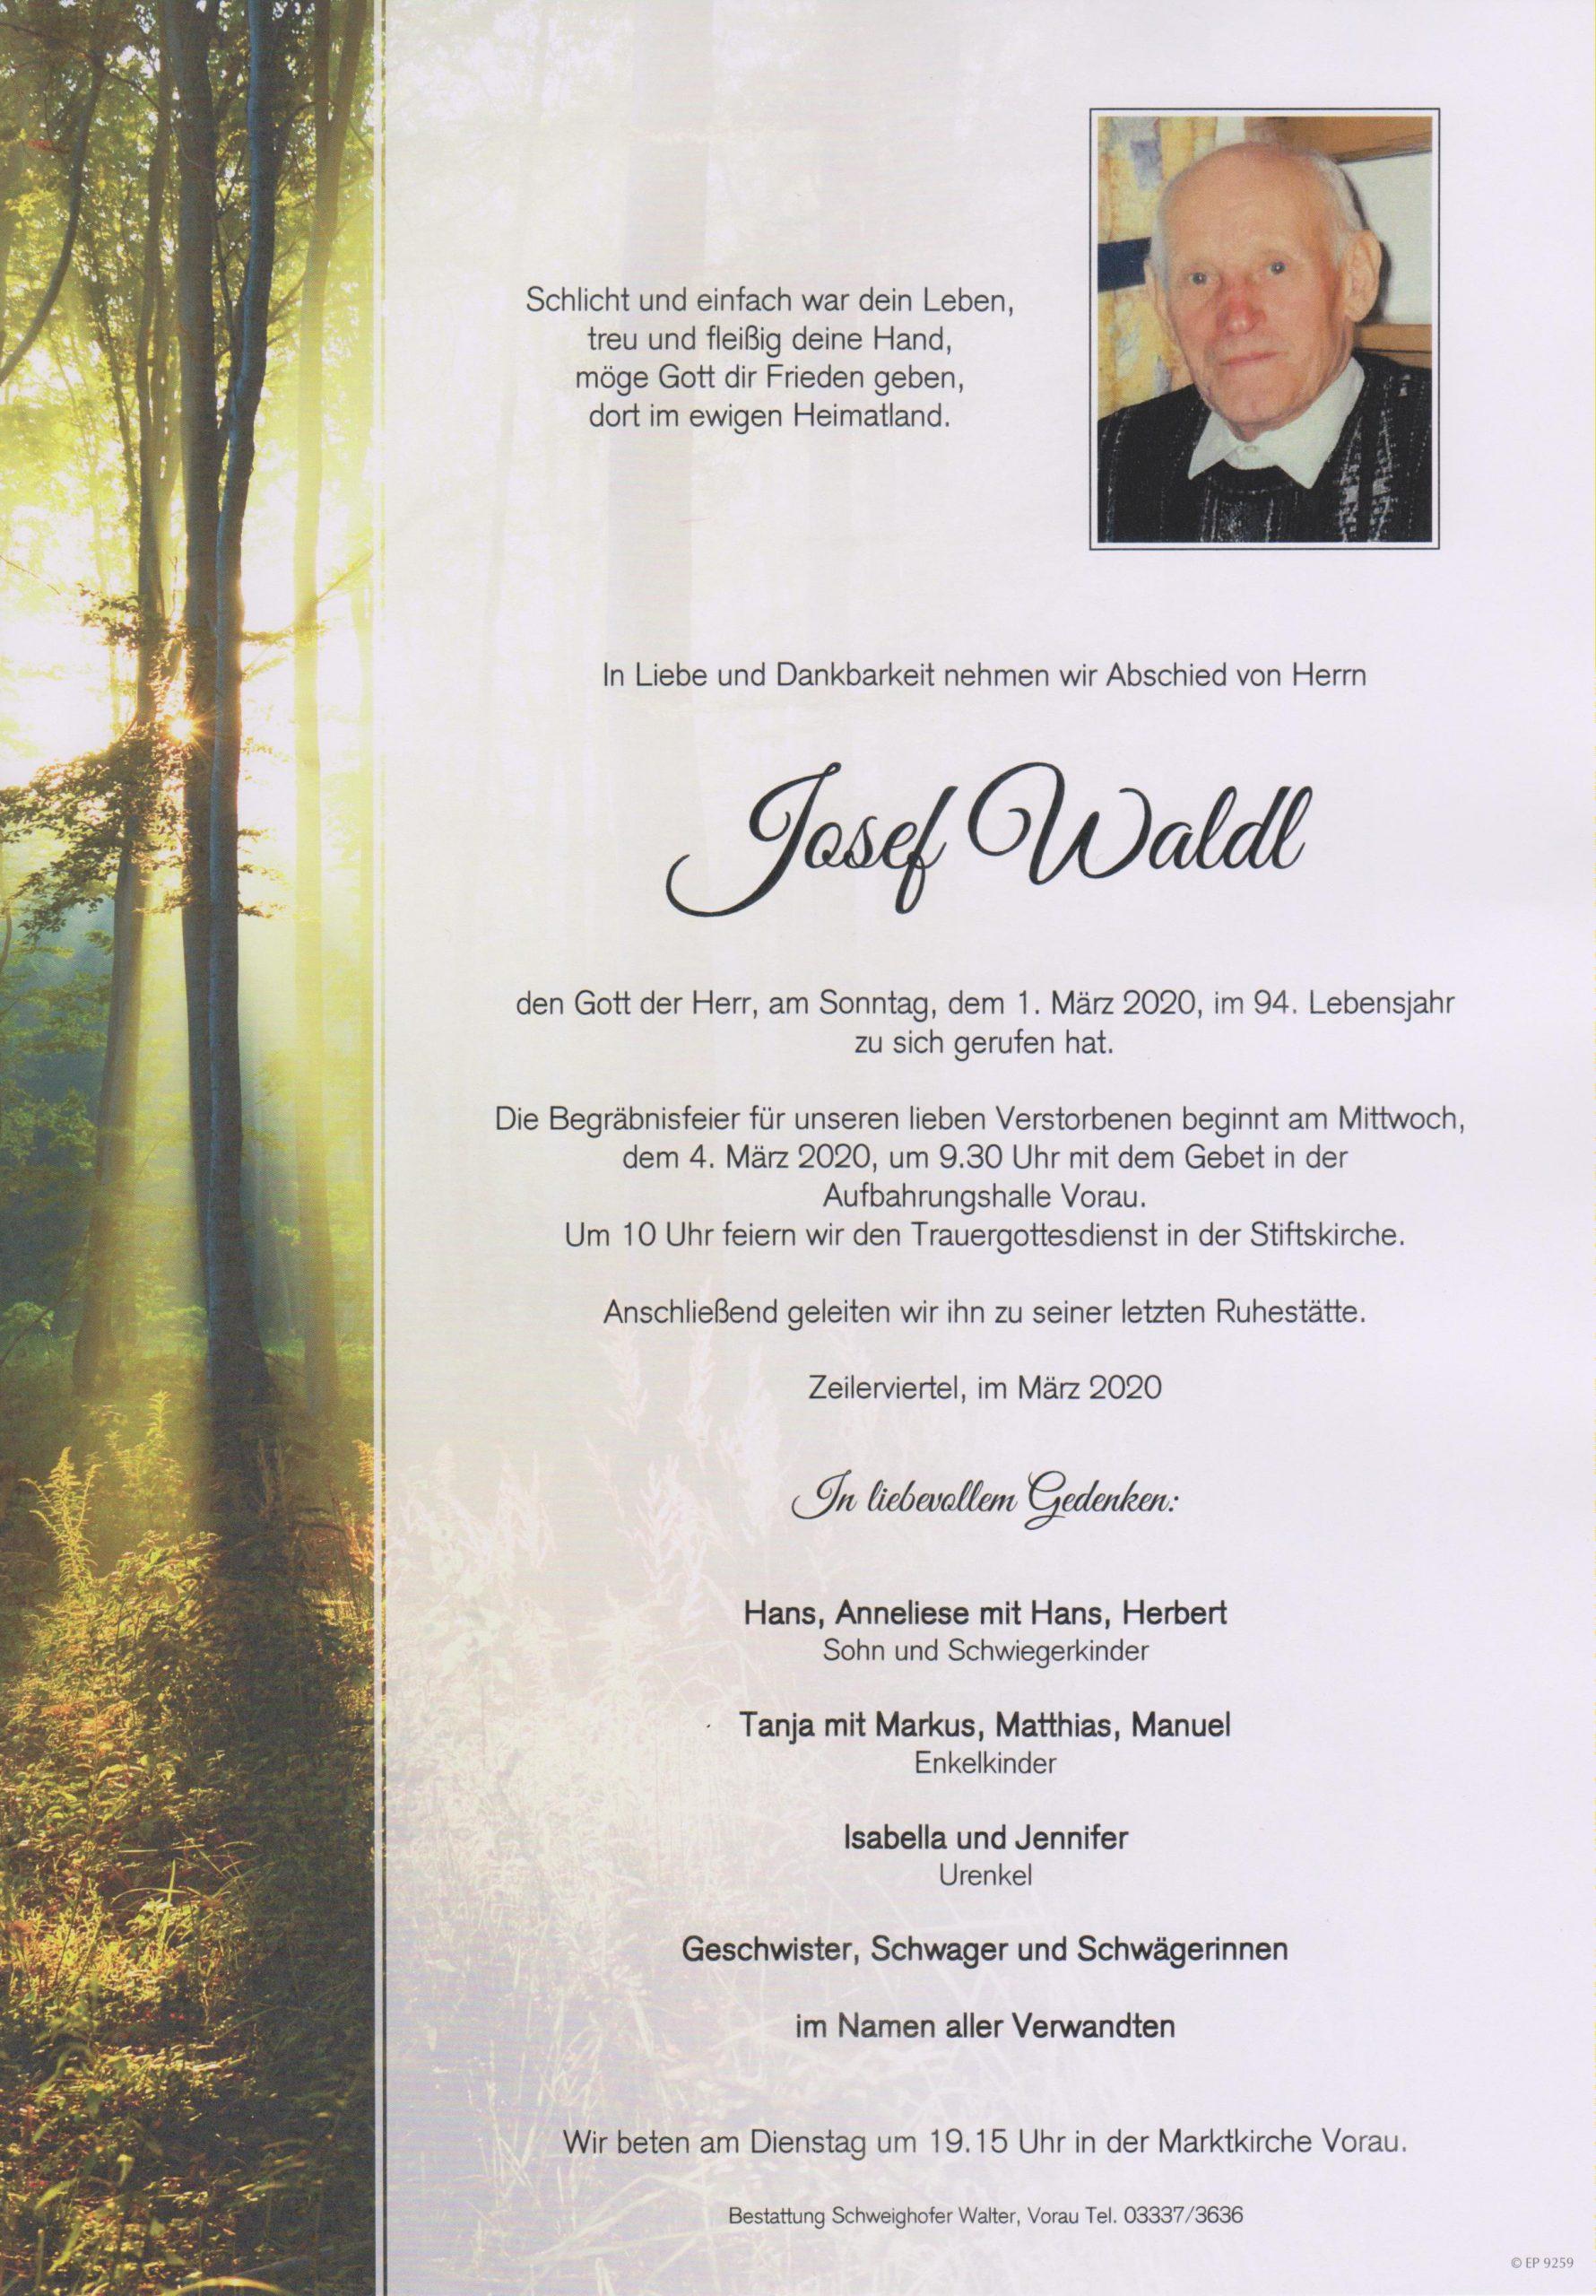 Josef Waldl